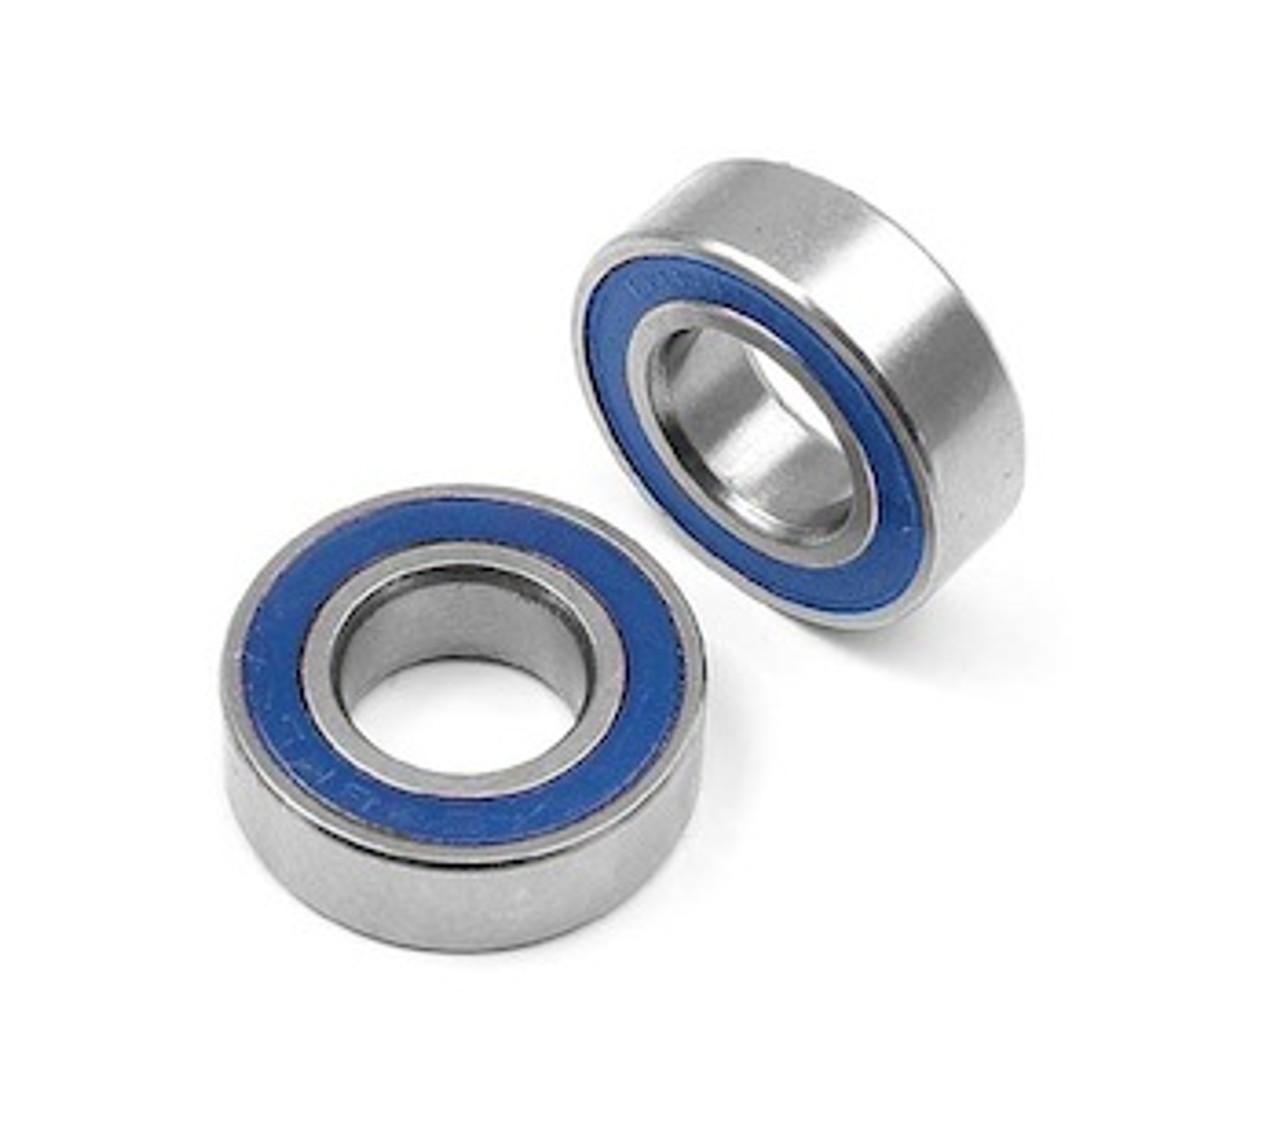 Bearings Metric Series 8x16x5 MM rubber sealed (2 Pack) (688 2RS)